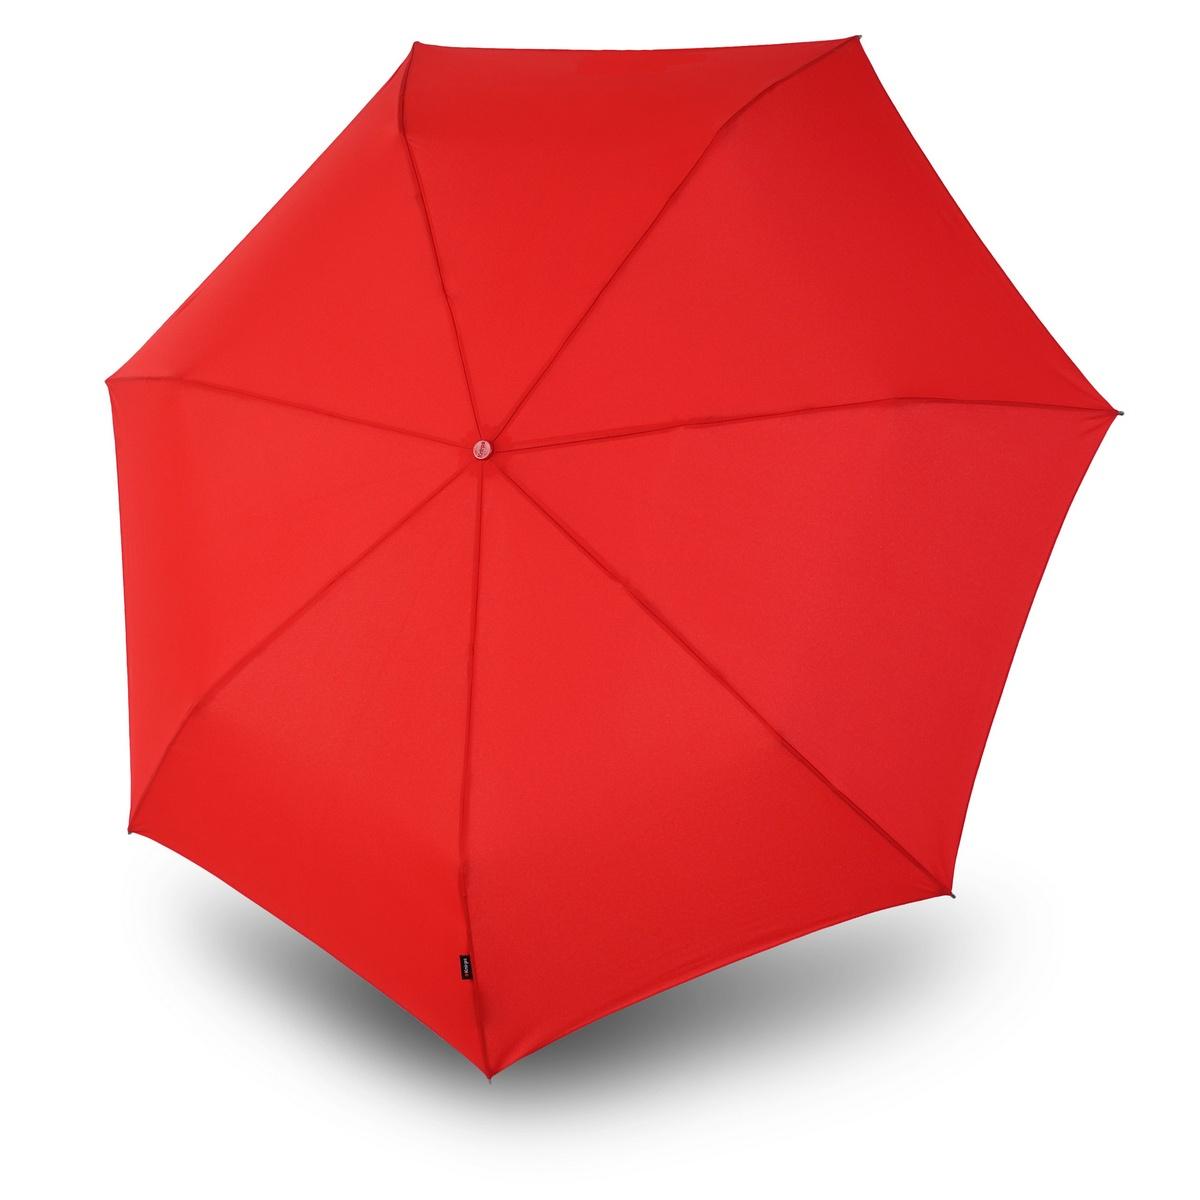 Зонт Knirps Floyd Duomatic, красный knirps floyd umbrella